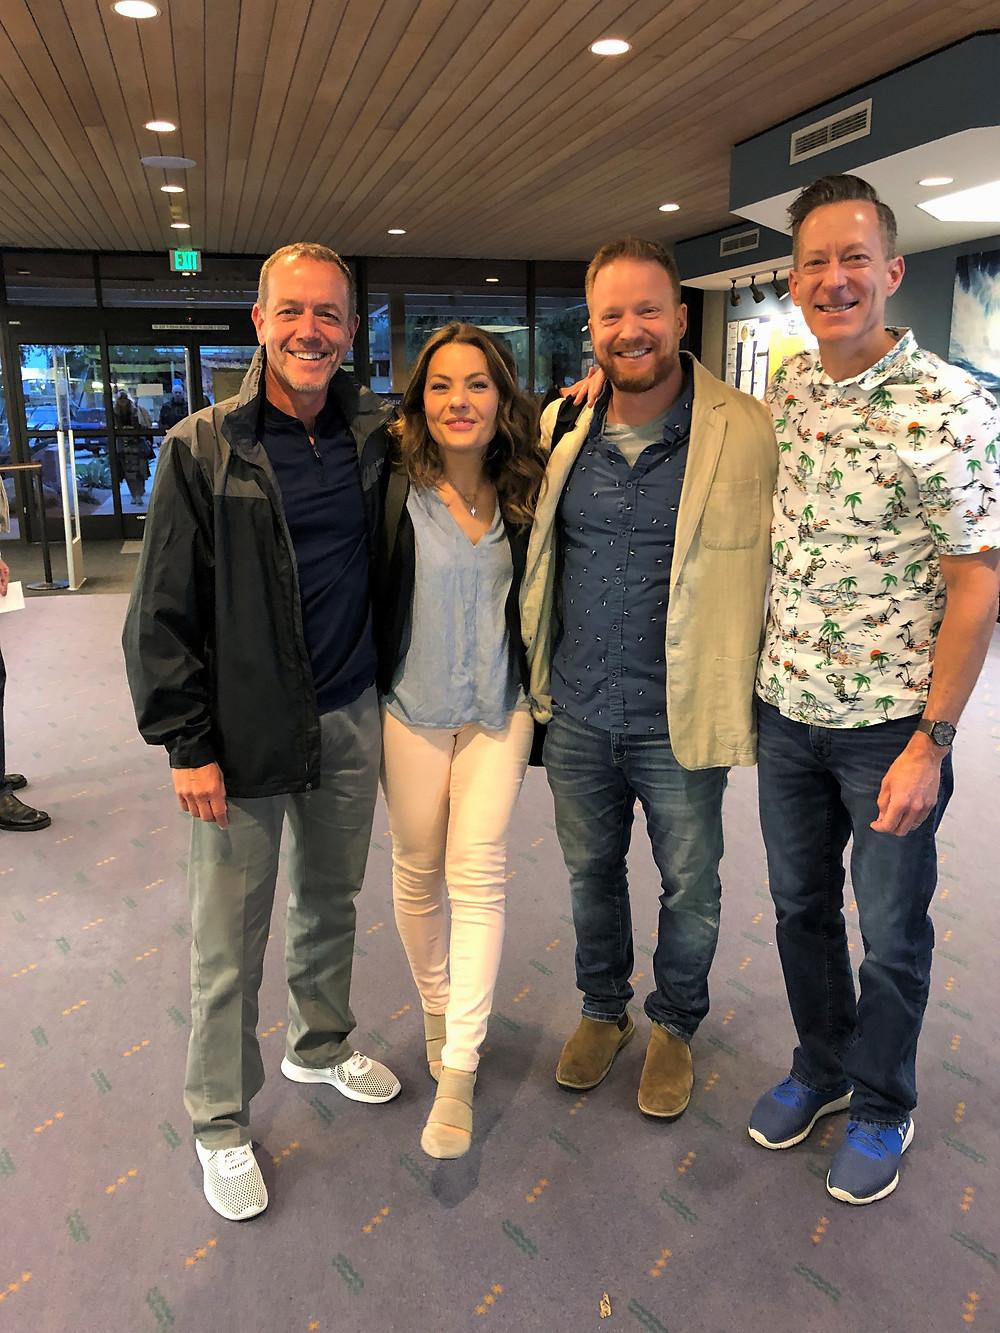 Meeting Eric and Lindsey Bennett, hosts of the HGTV show 'Desert Flippers'.